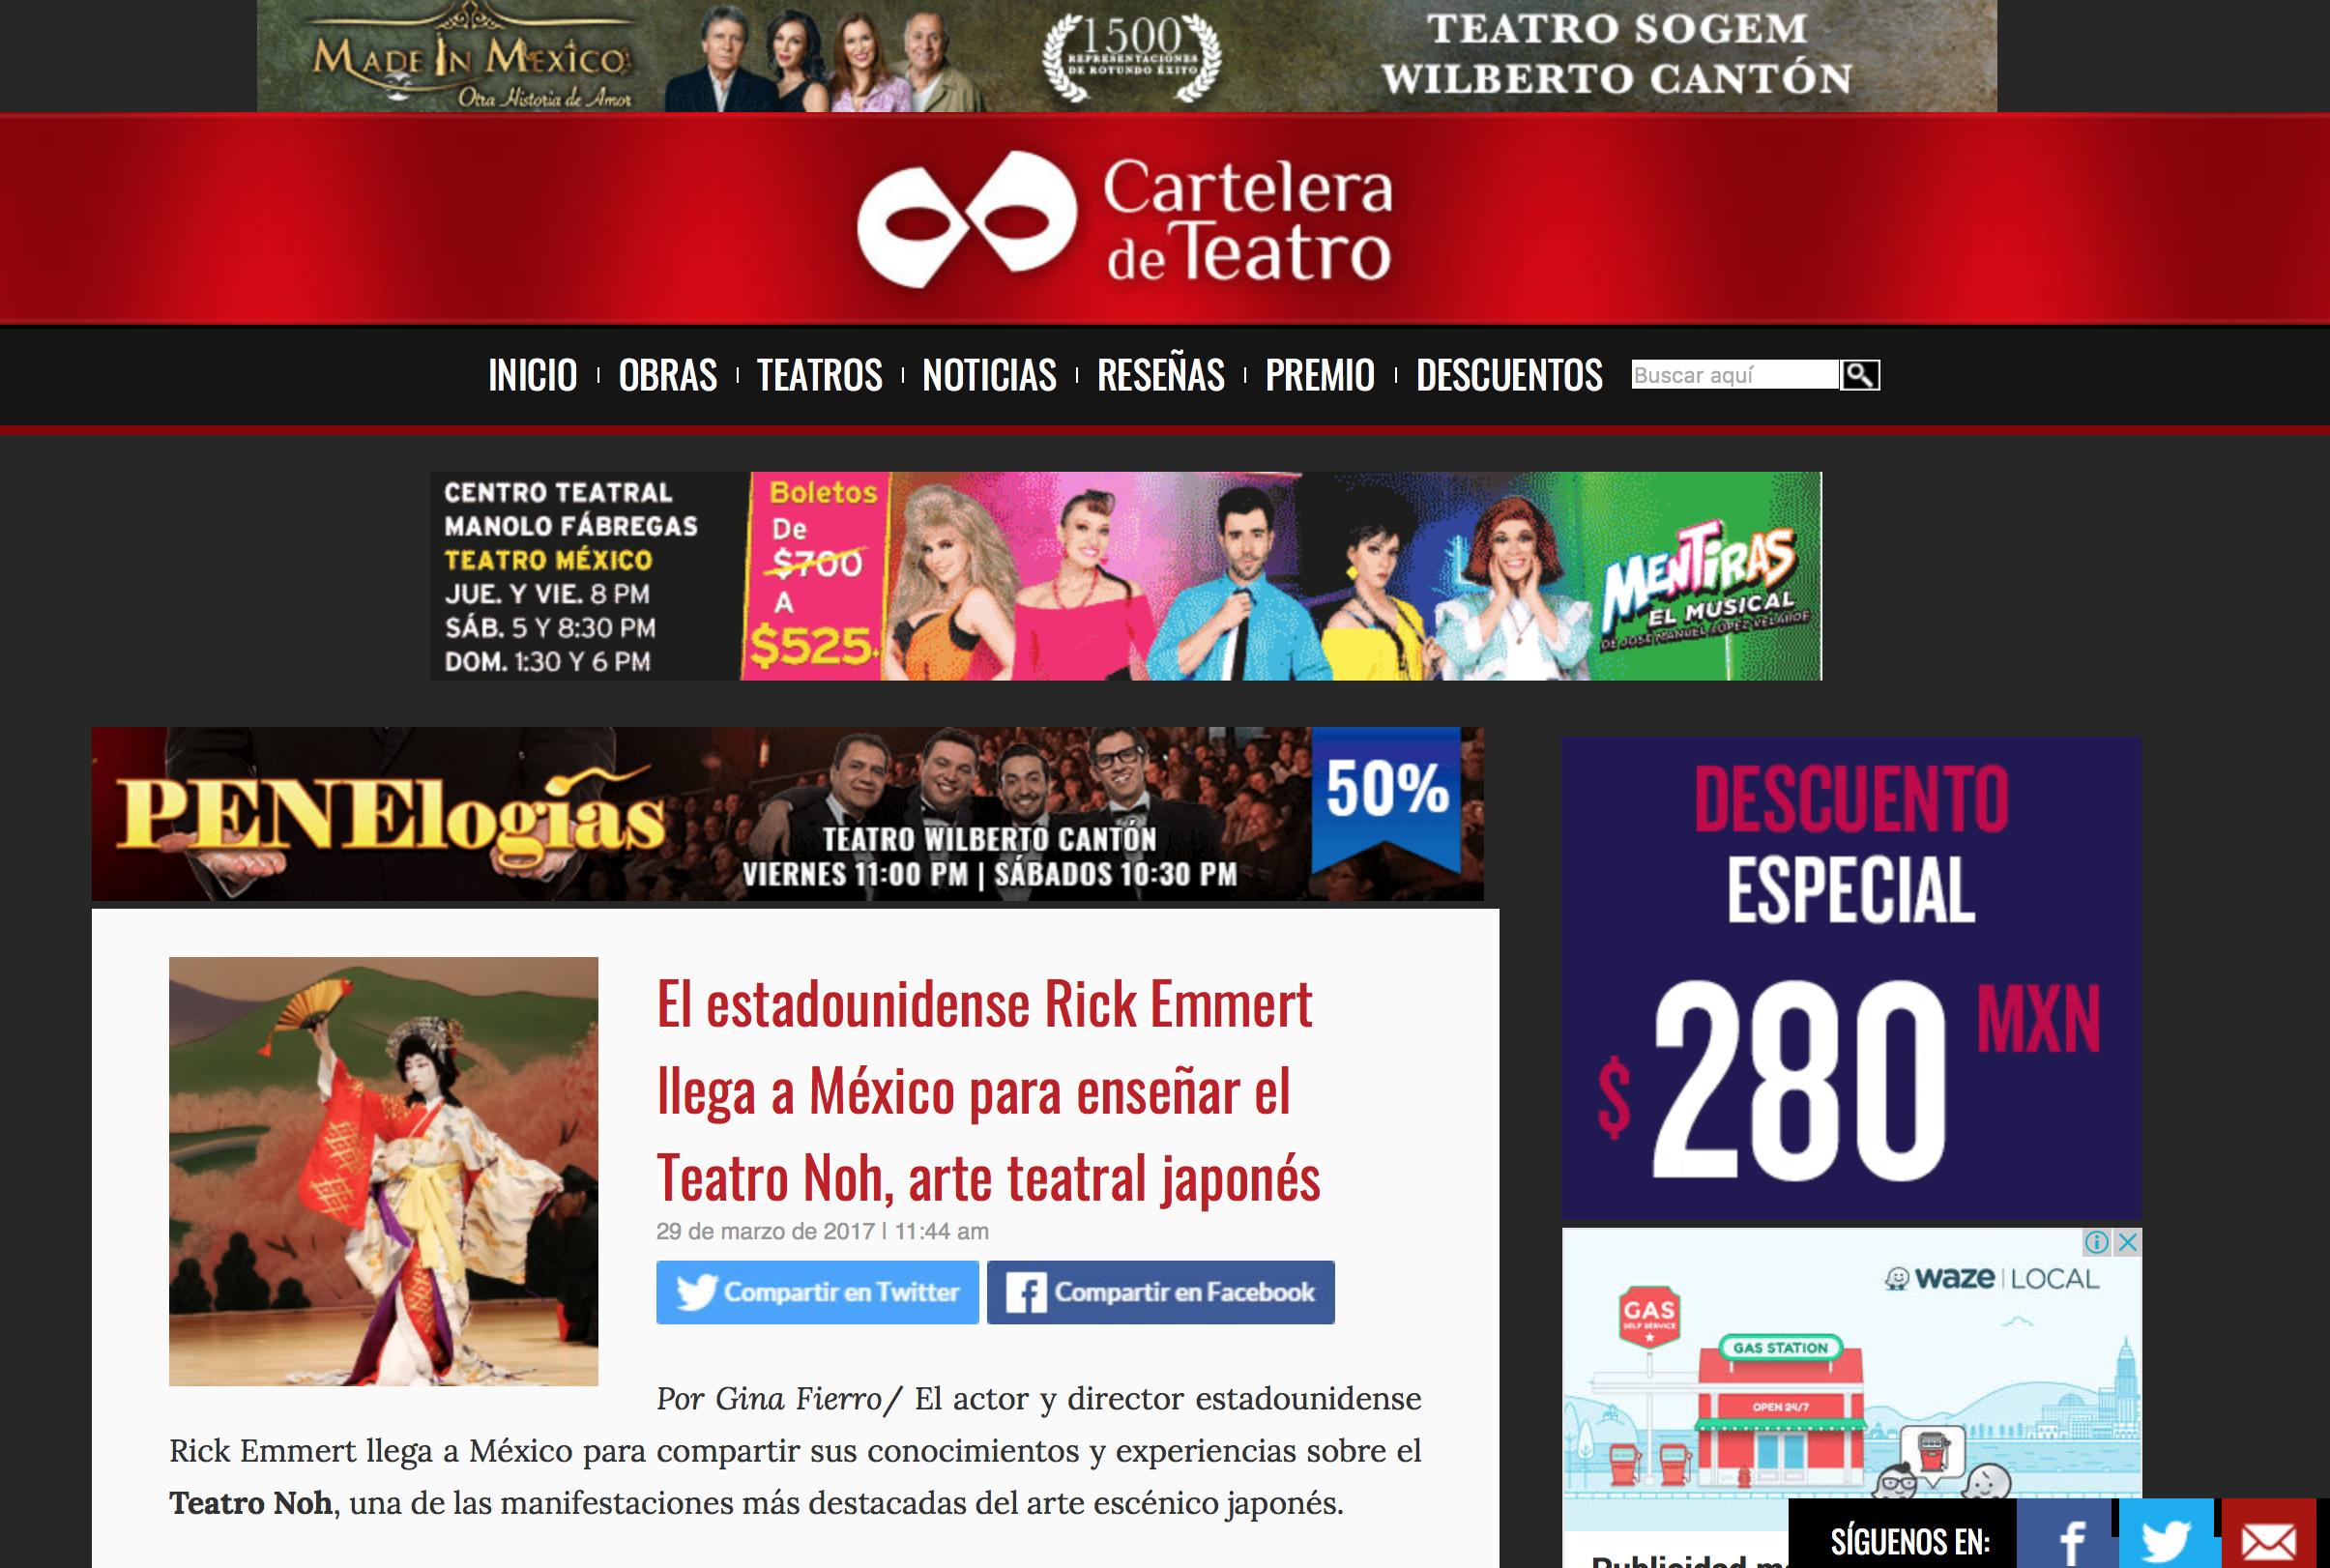 Prensa / Cartelera de Teatro -